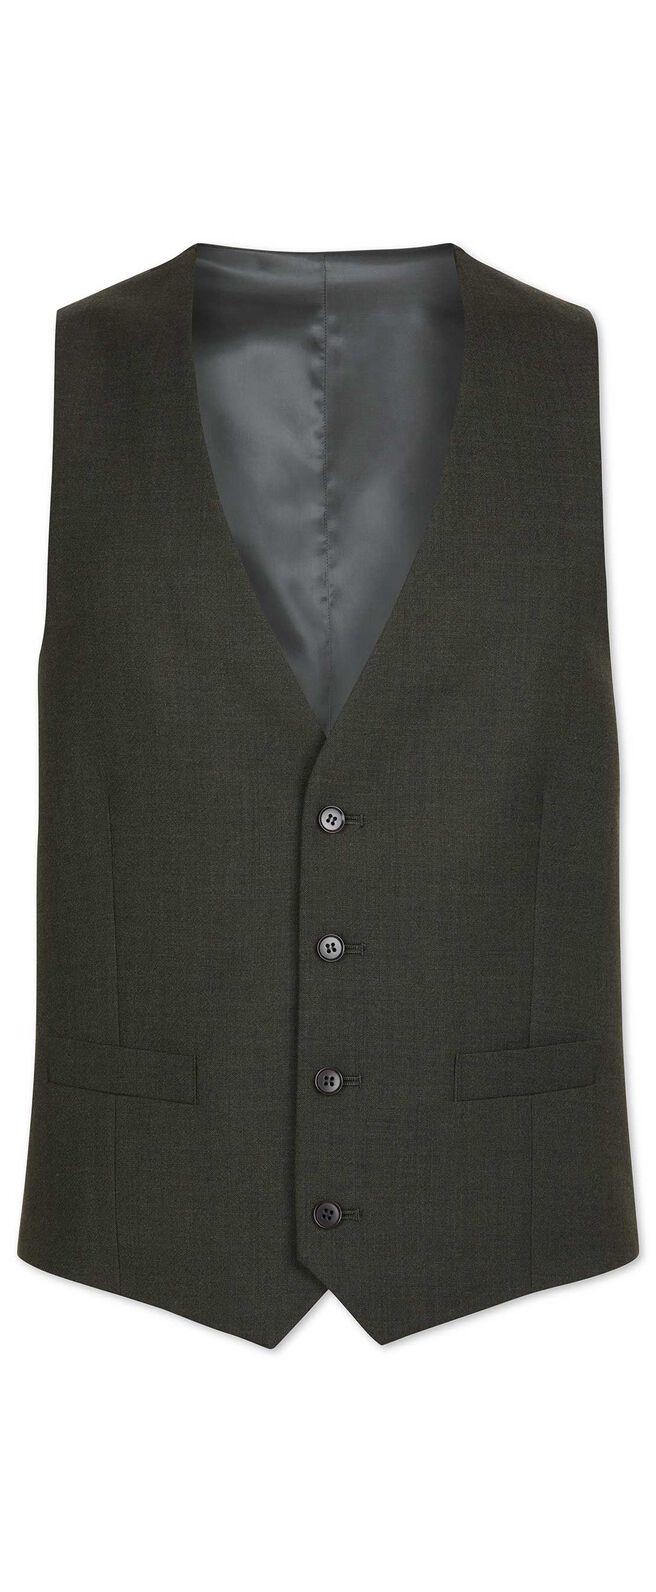 Green slim fit merino business suit